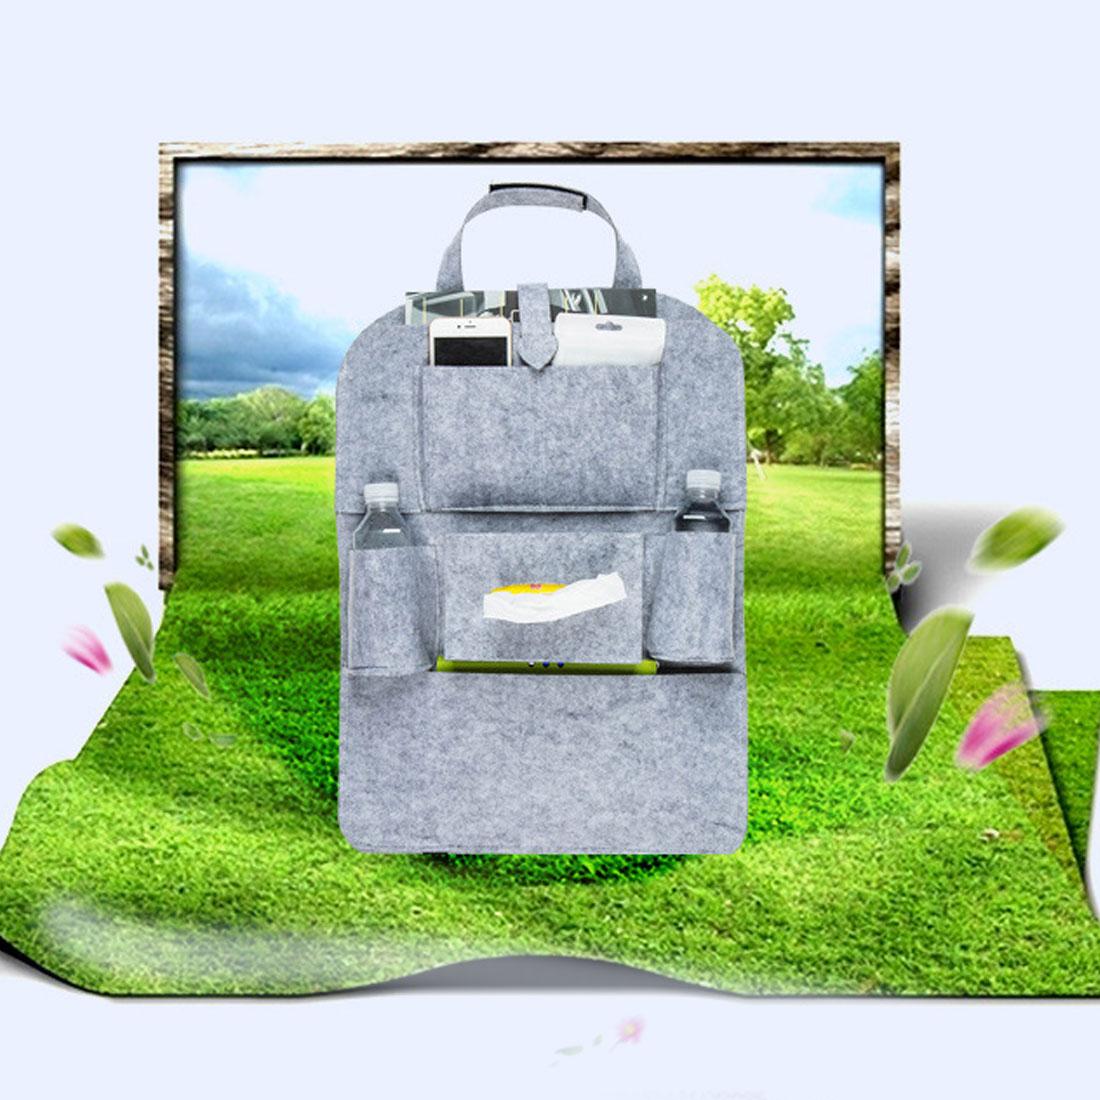 Dewtreetali hot sale Car Storage Bag Organizer Back Seat Universal Bags Backseat Trunk Travel Holder Box Pockets Protector